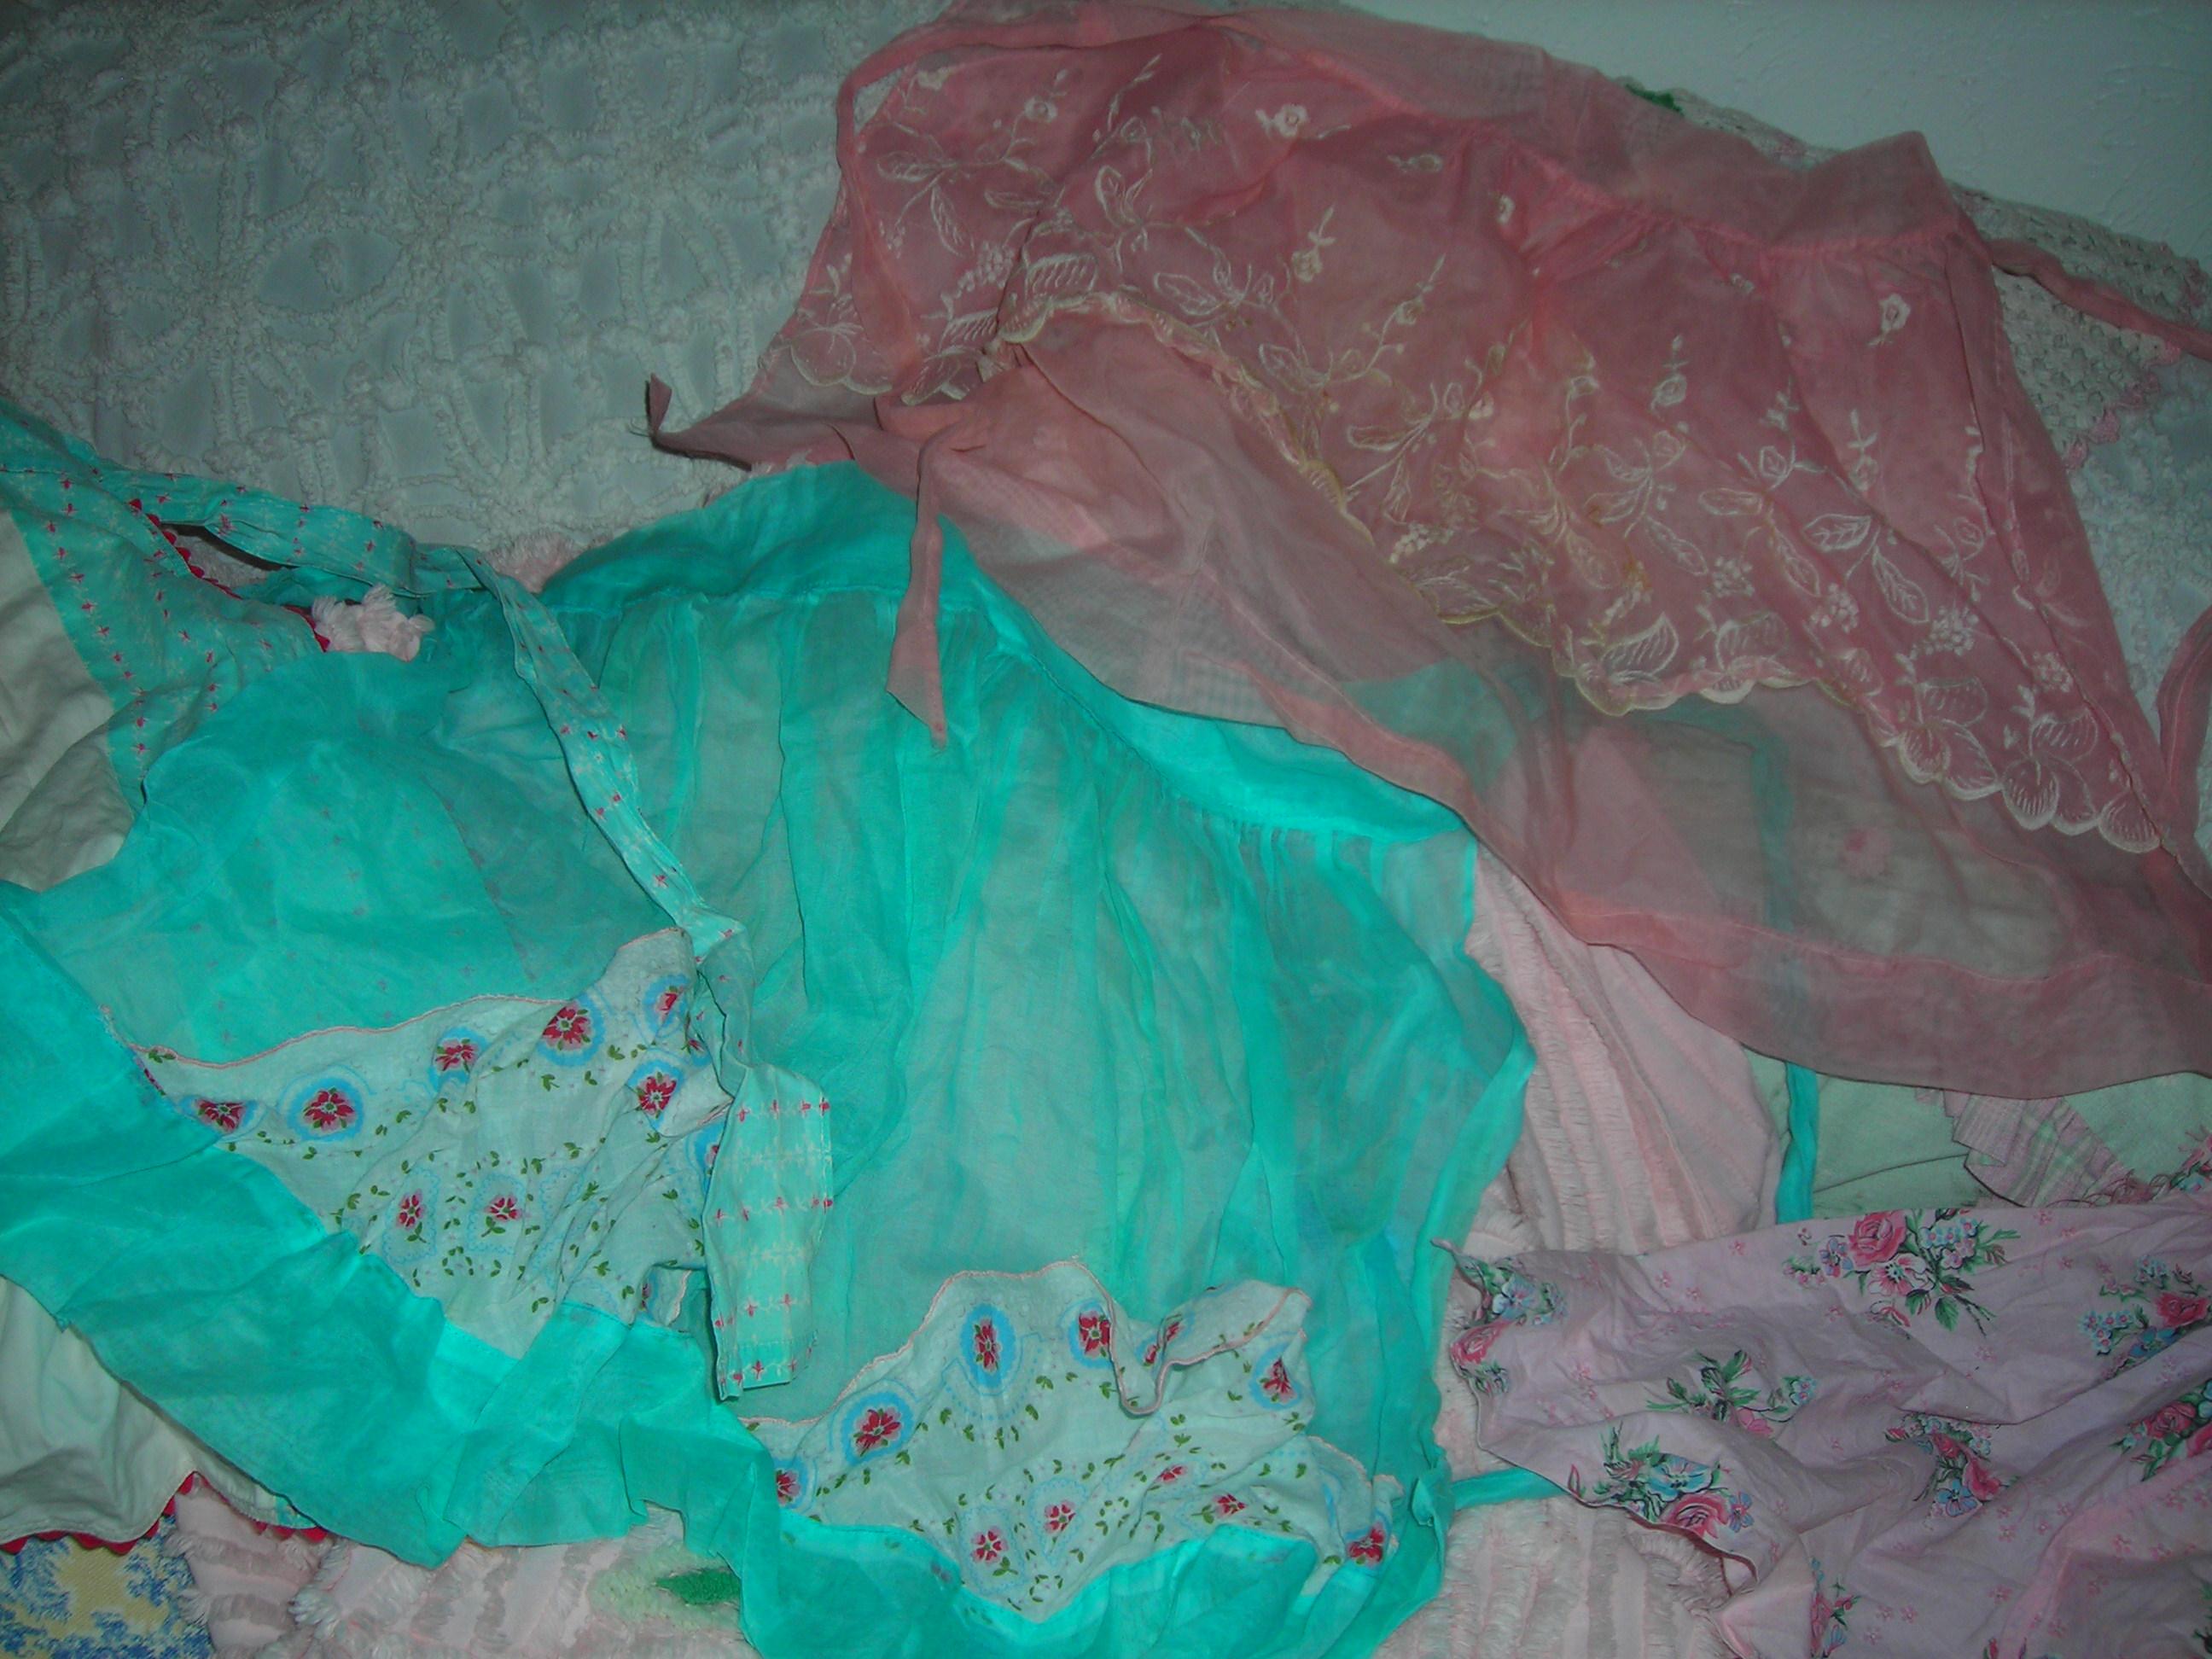 vintage aprons ... ohmygosh too sweet!